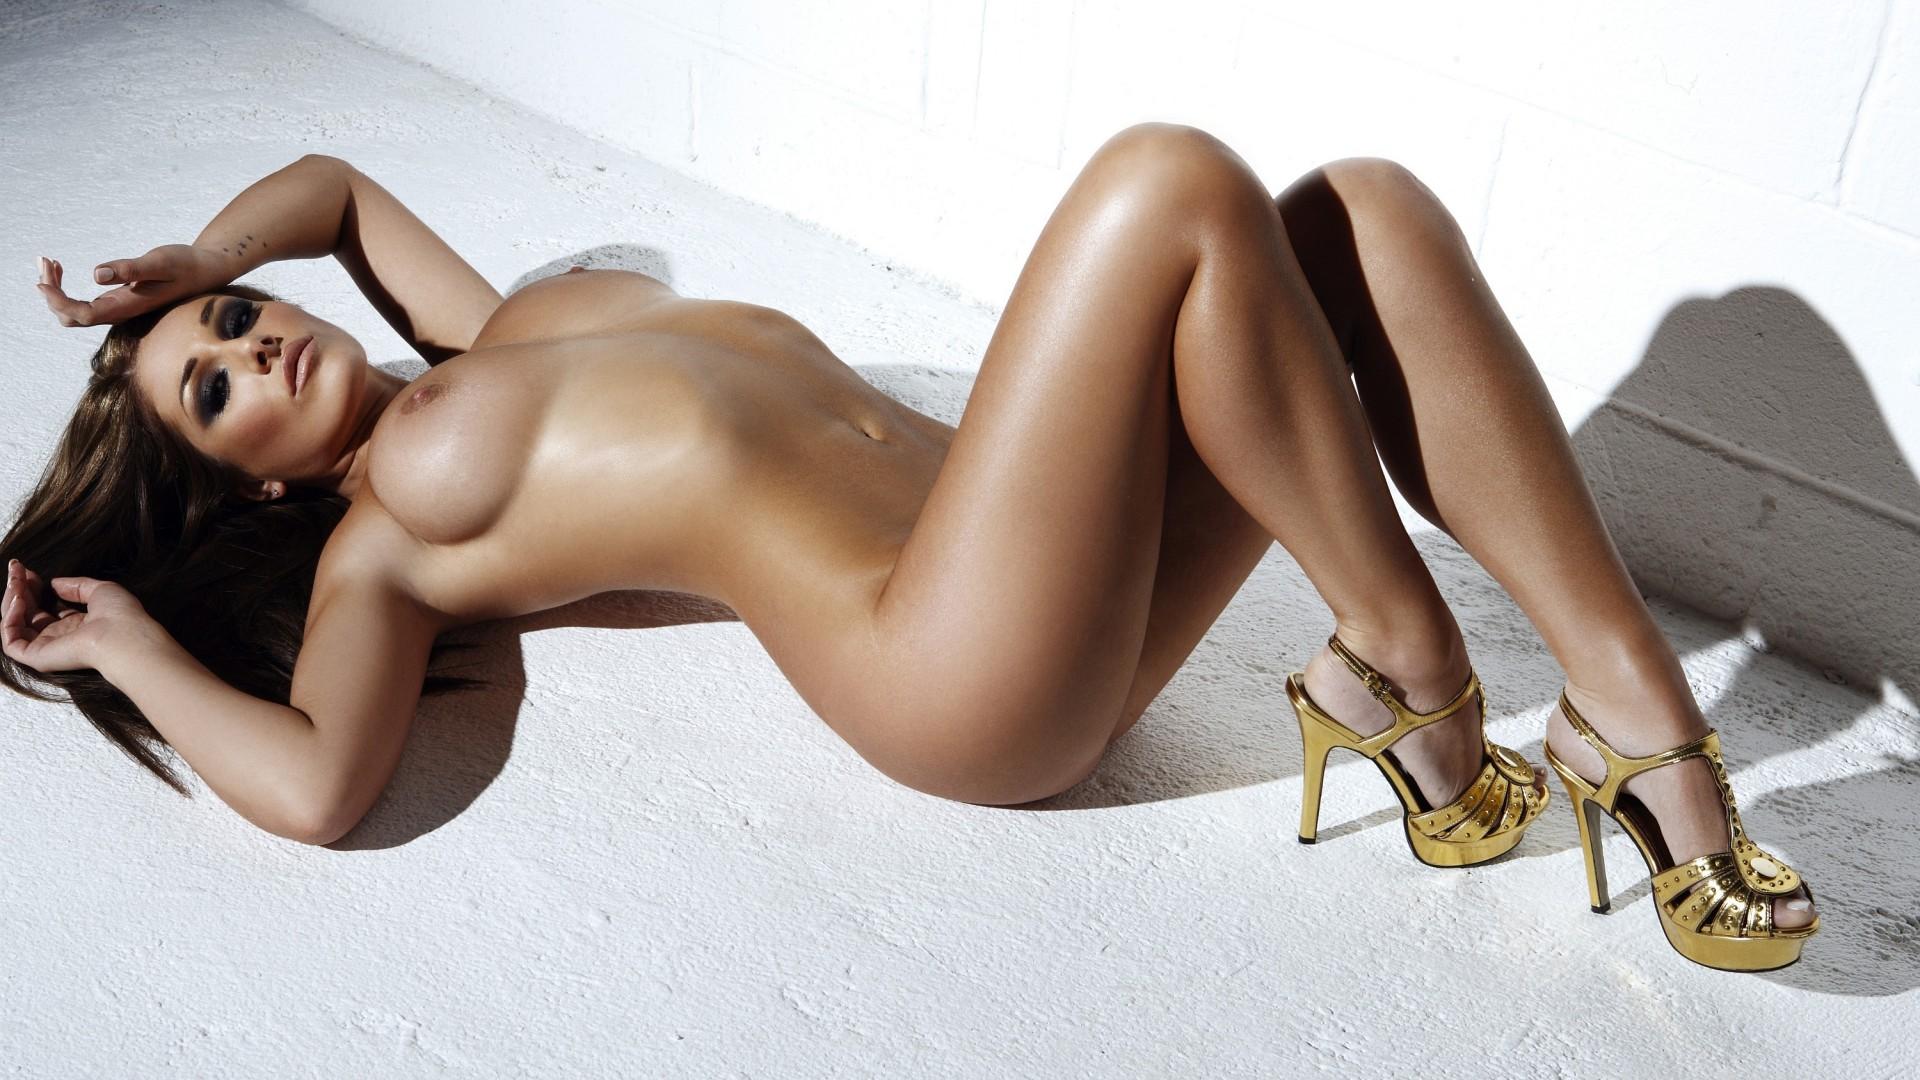 Hot Sexy Legs Pics